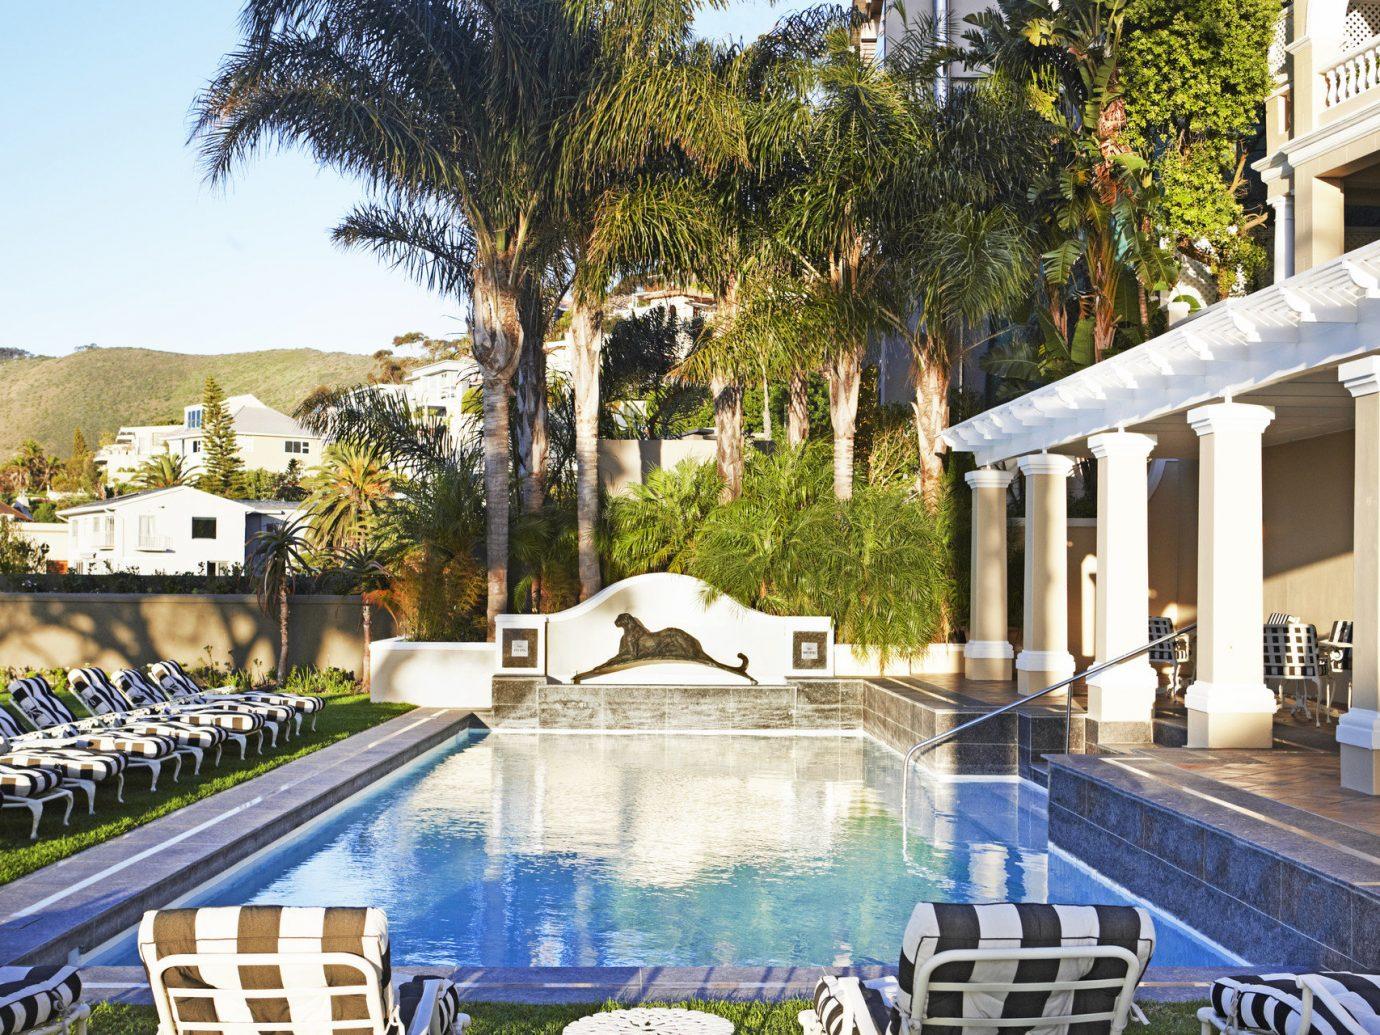 Hotels outdoor tree property leisure swimming pool estate mansion Resort home plaza Villa palace backyard